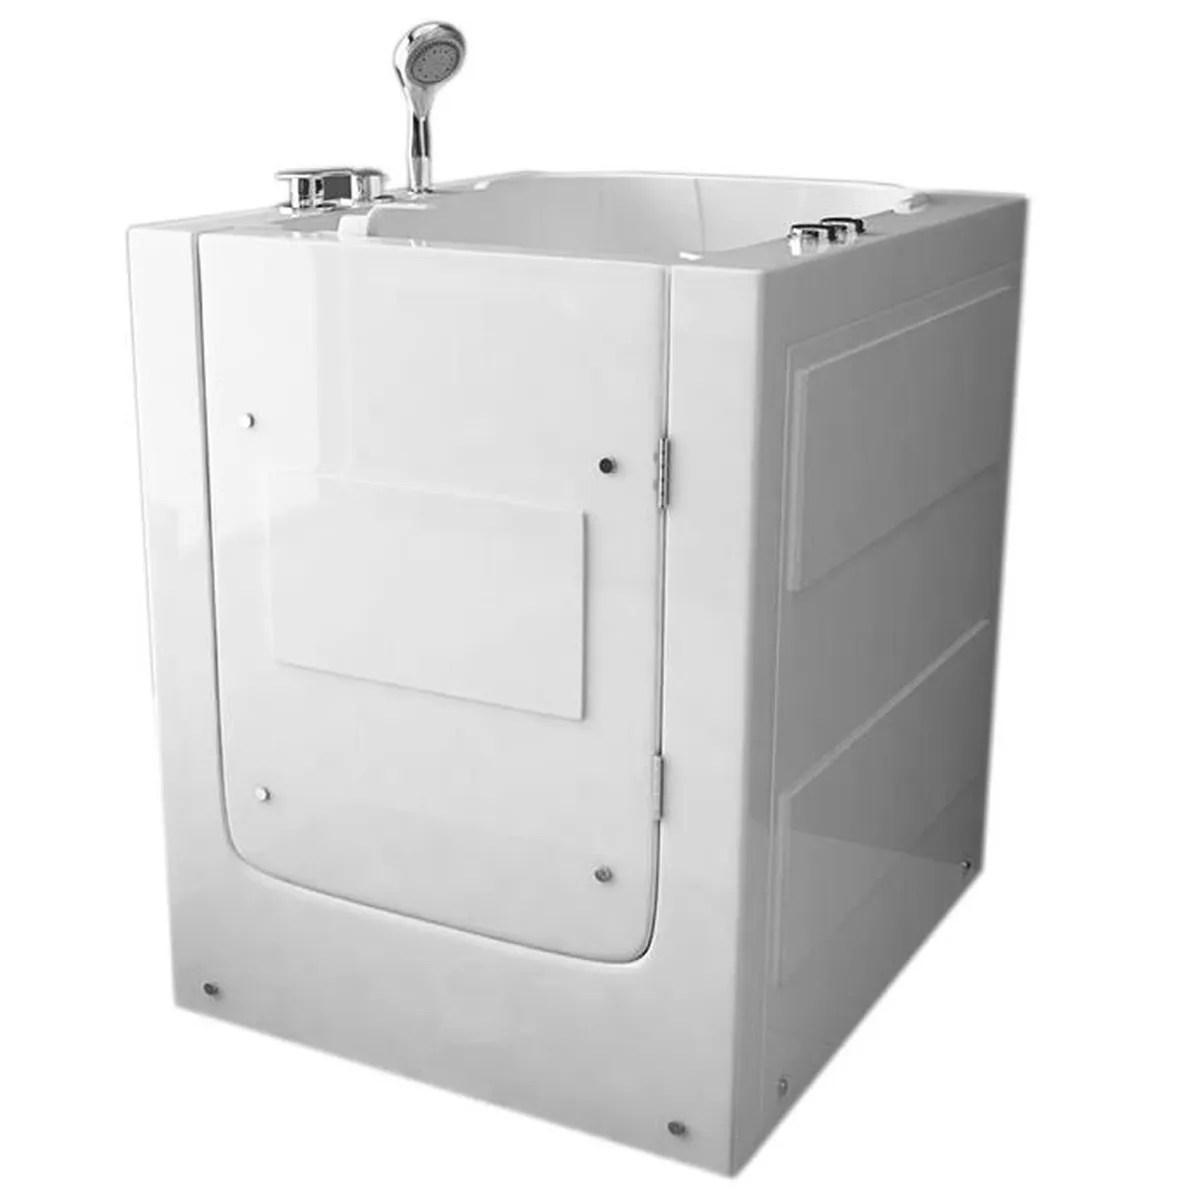 baignoire douche balneo avec porte